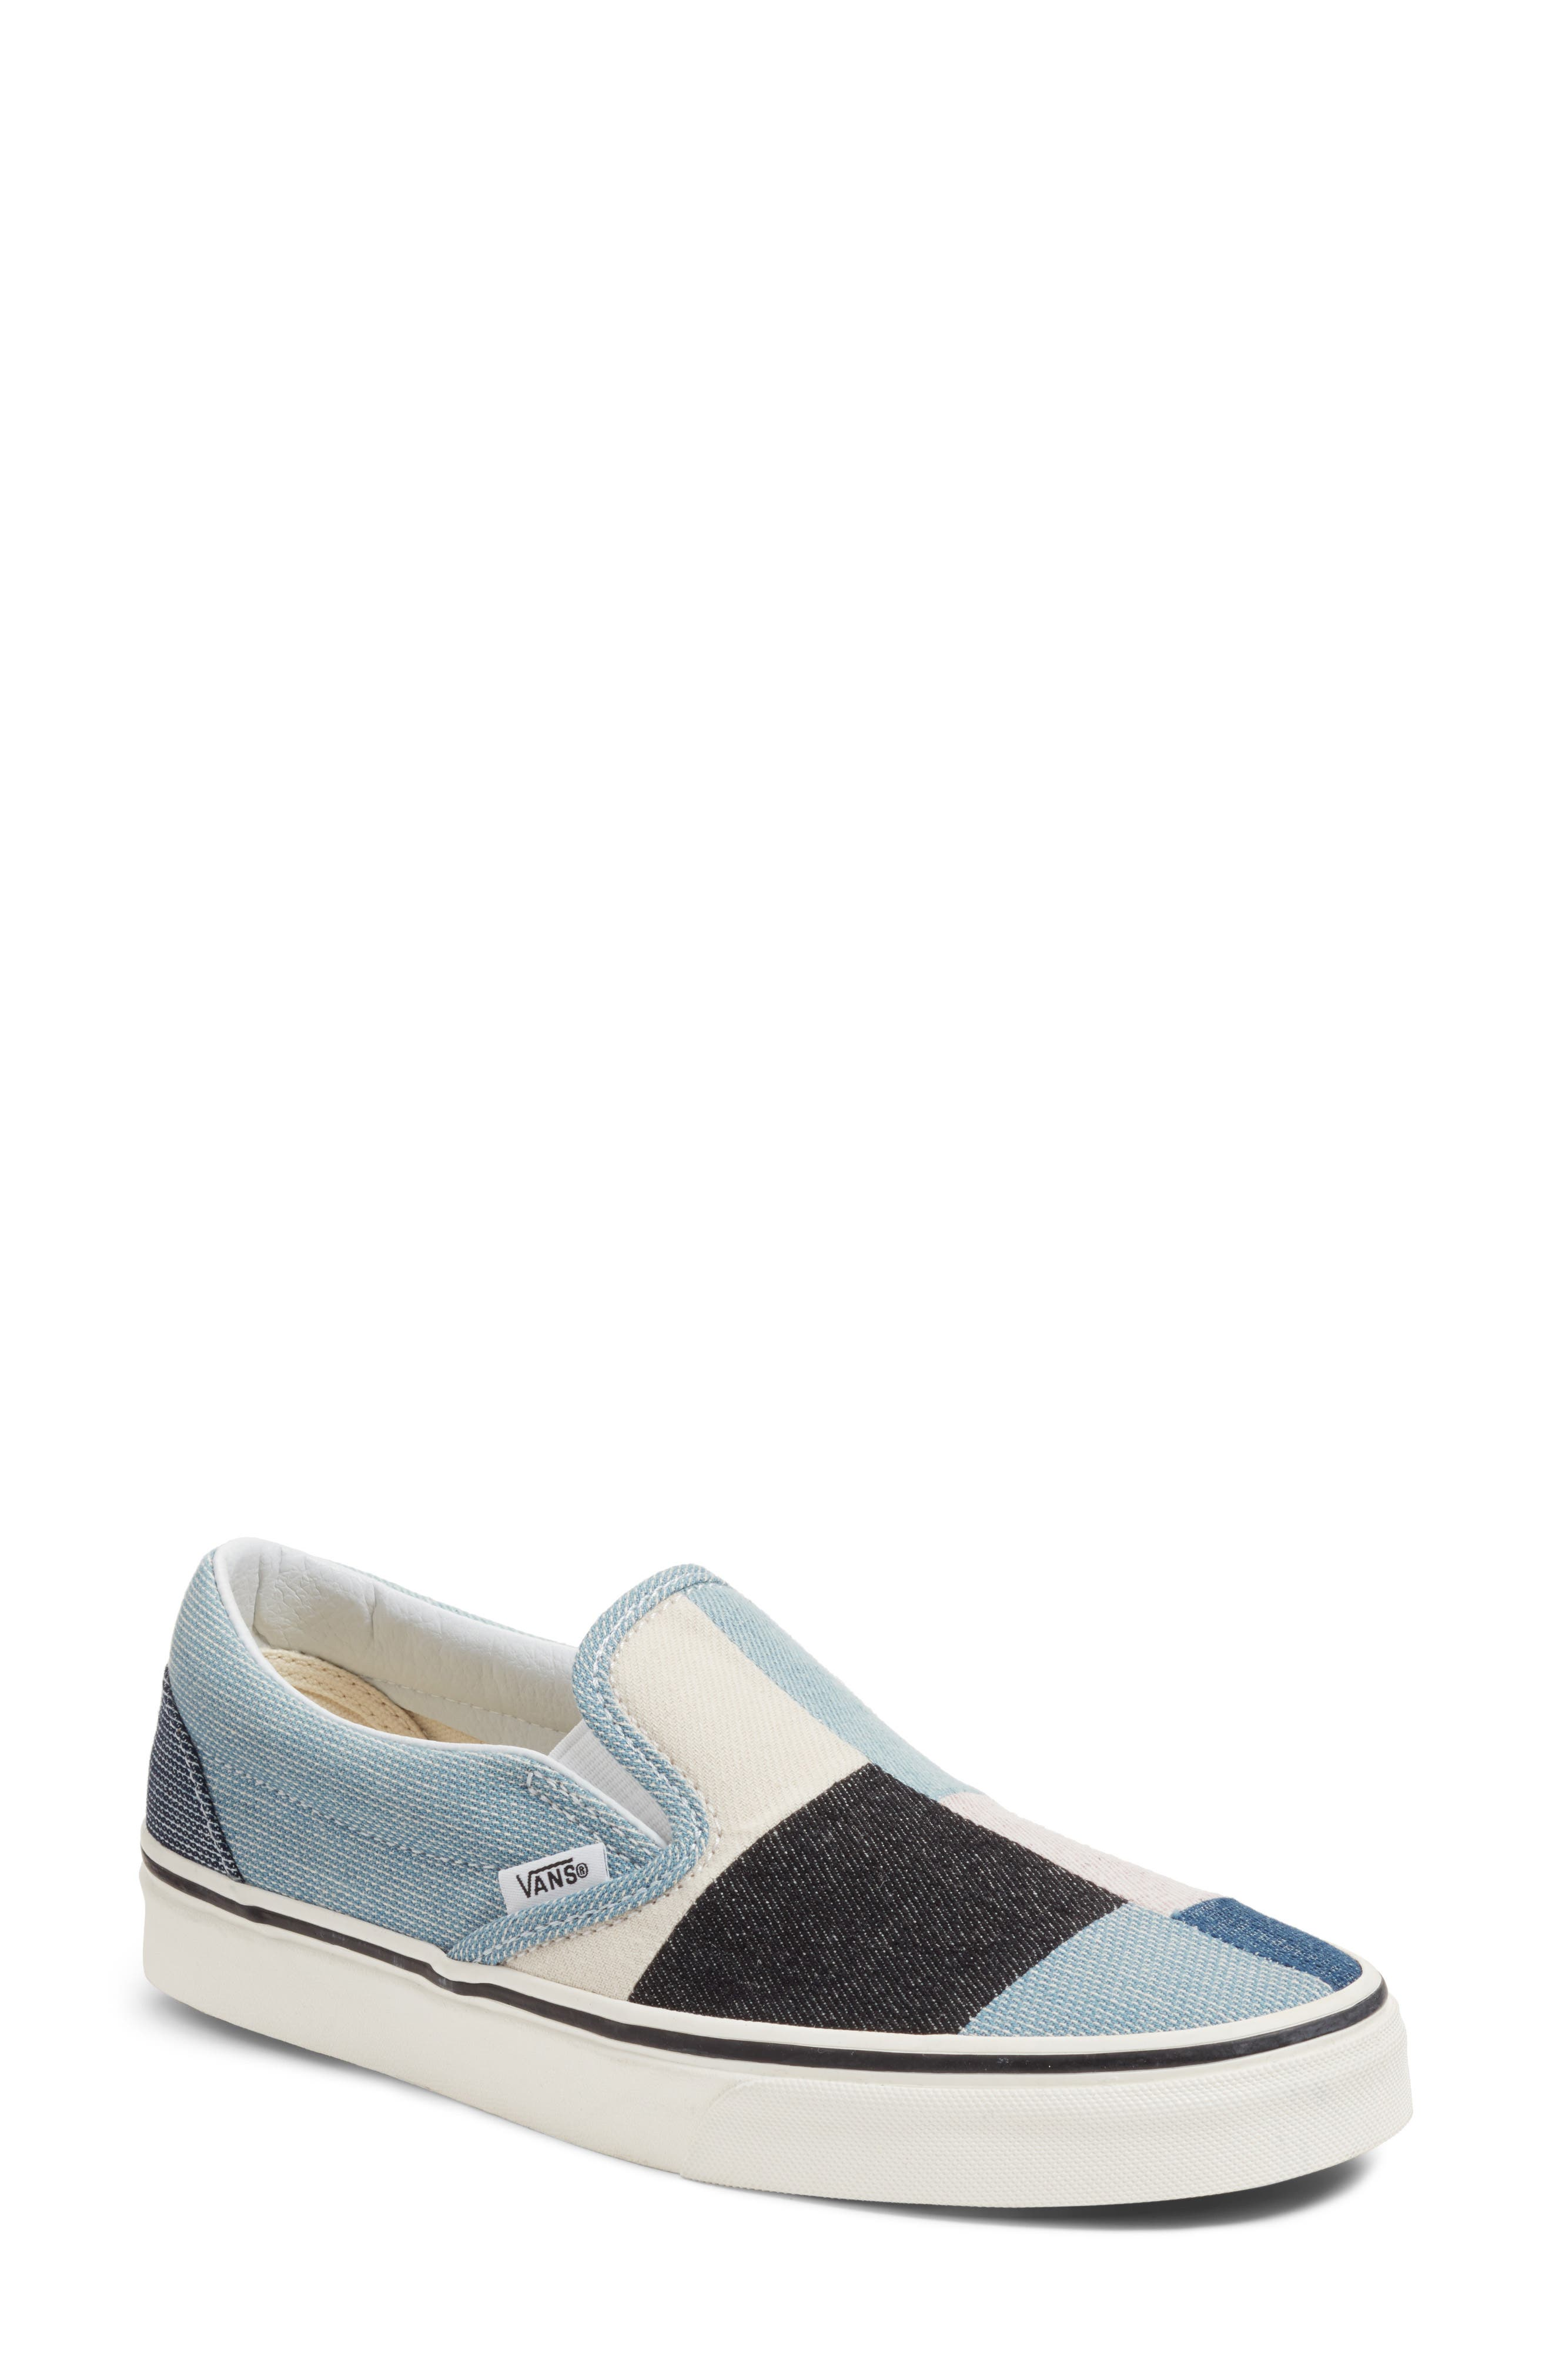 Slip-On Sneaker,                         Main,                         color, Patchwork Denim